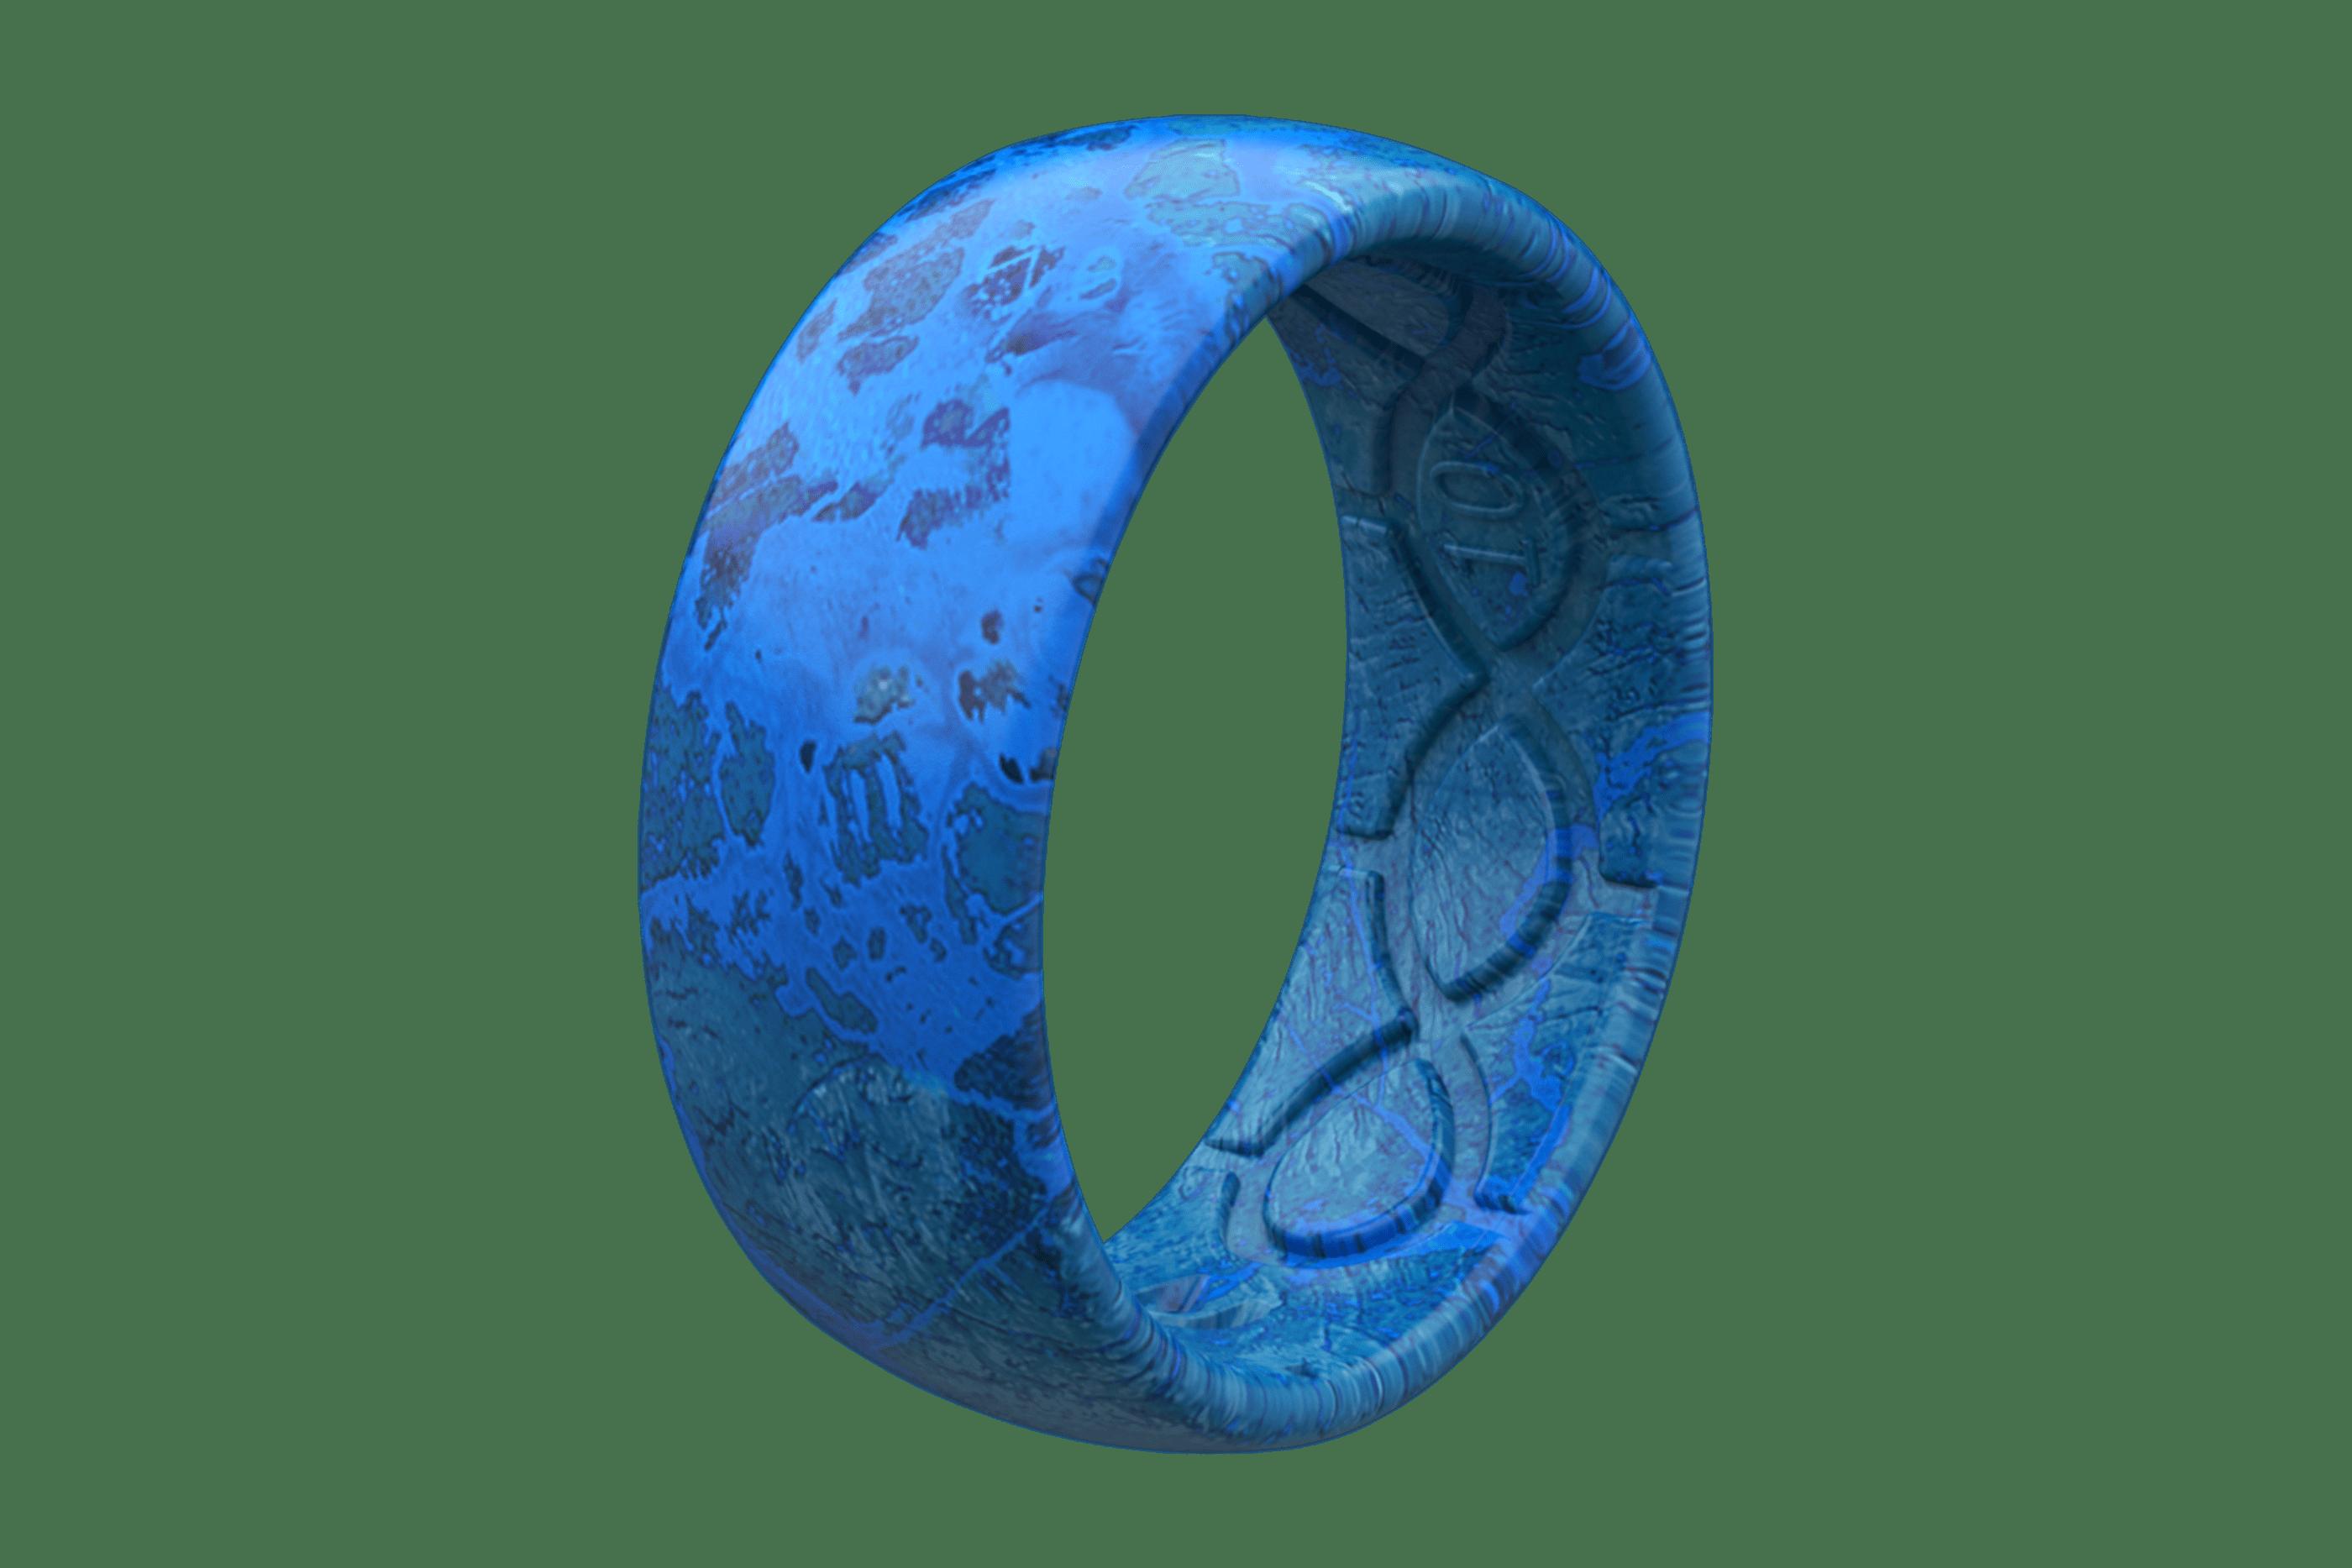 Original Camo Realtree Wav - Groove Life Silicone Wedding Rings